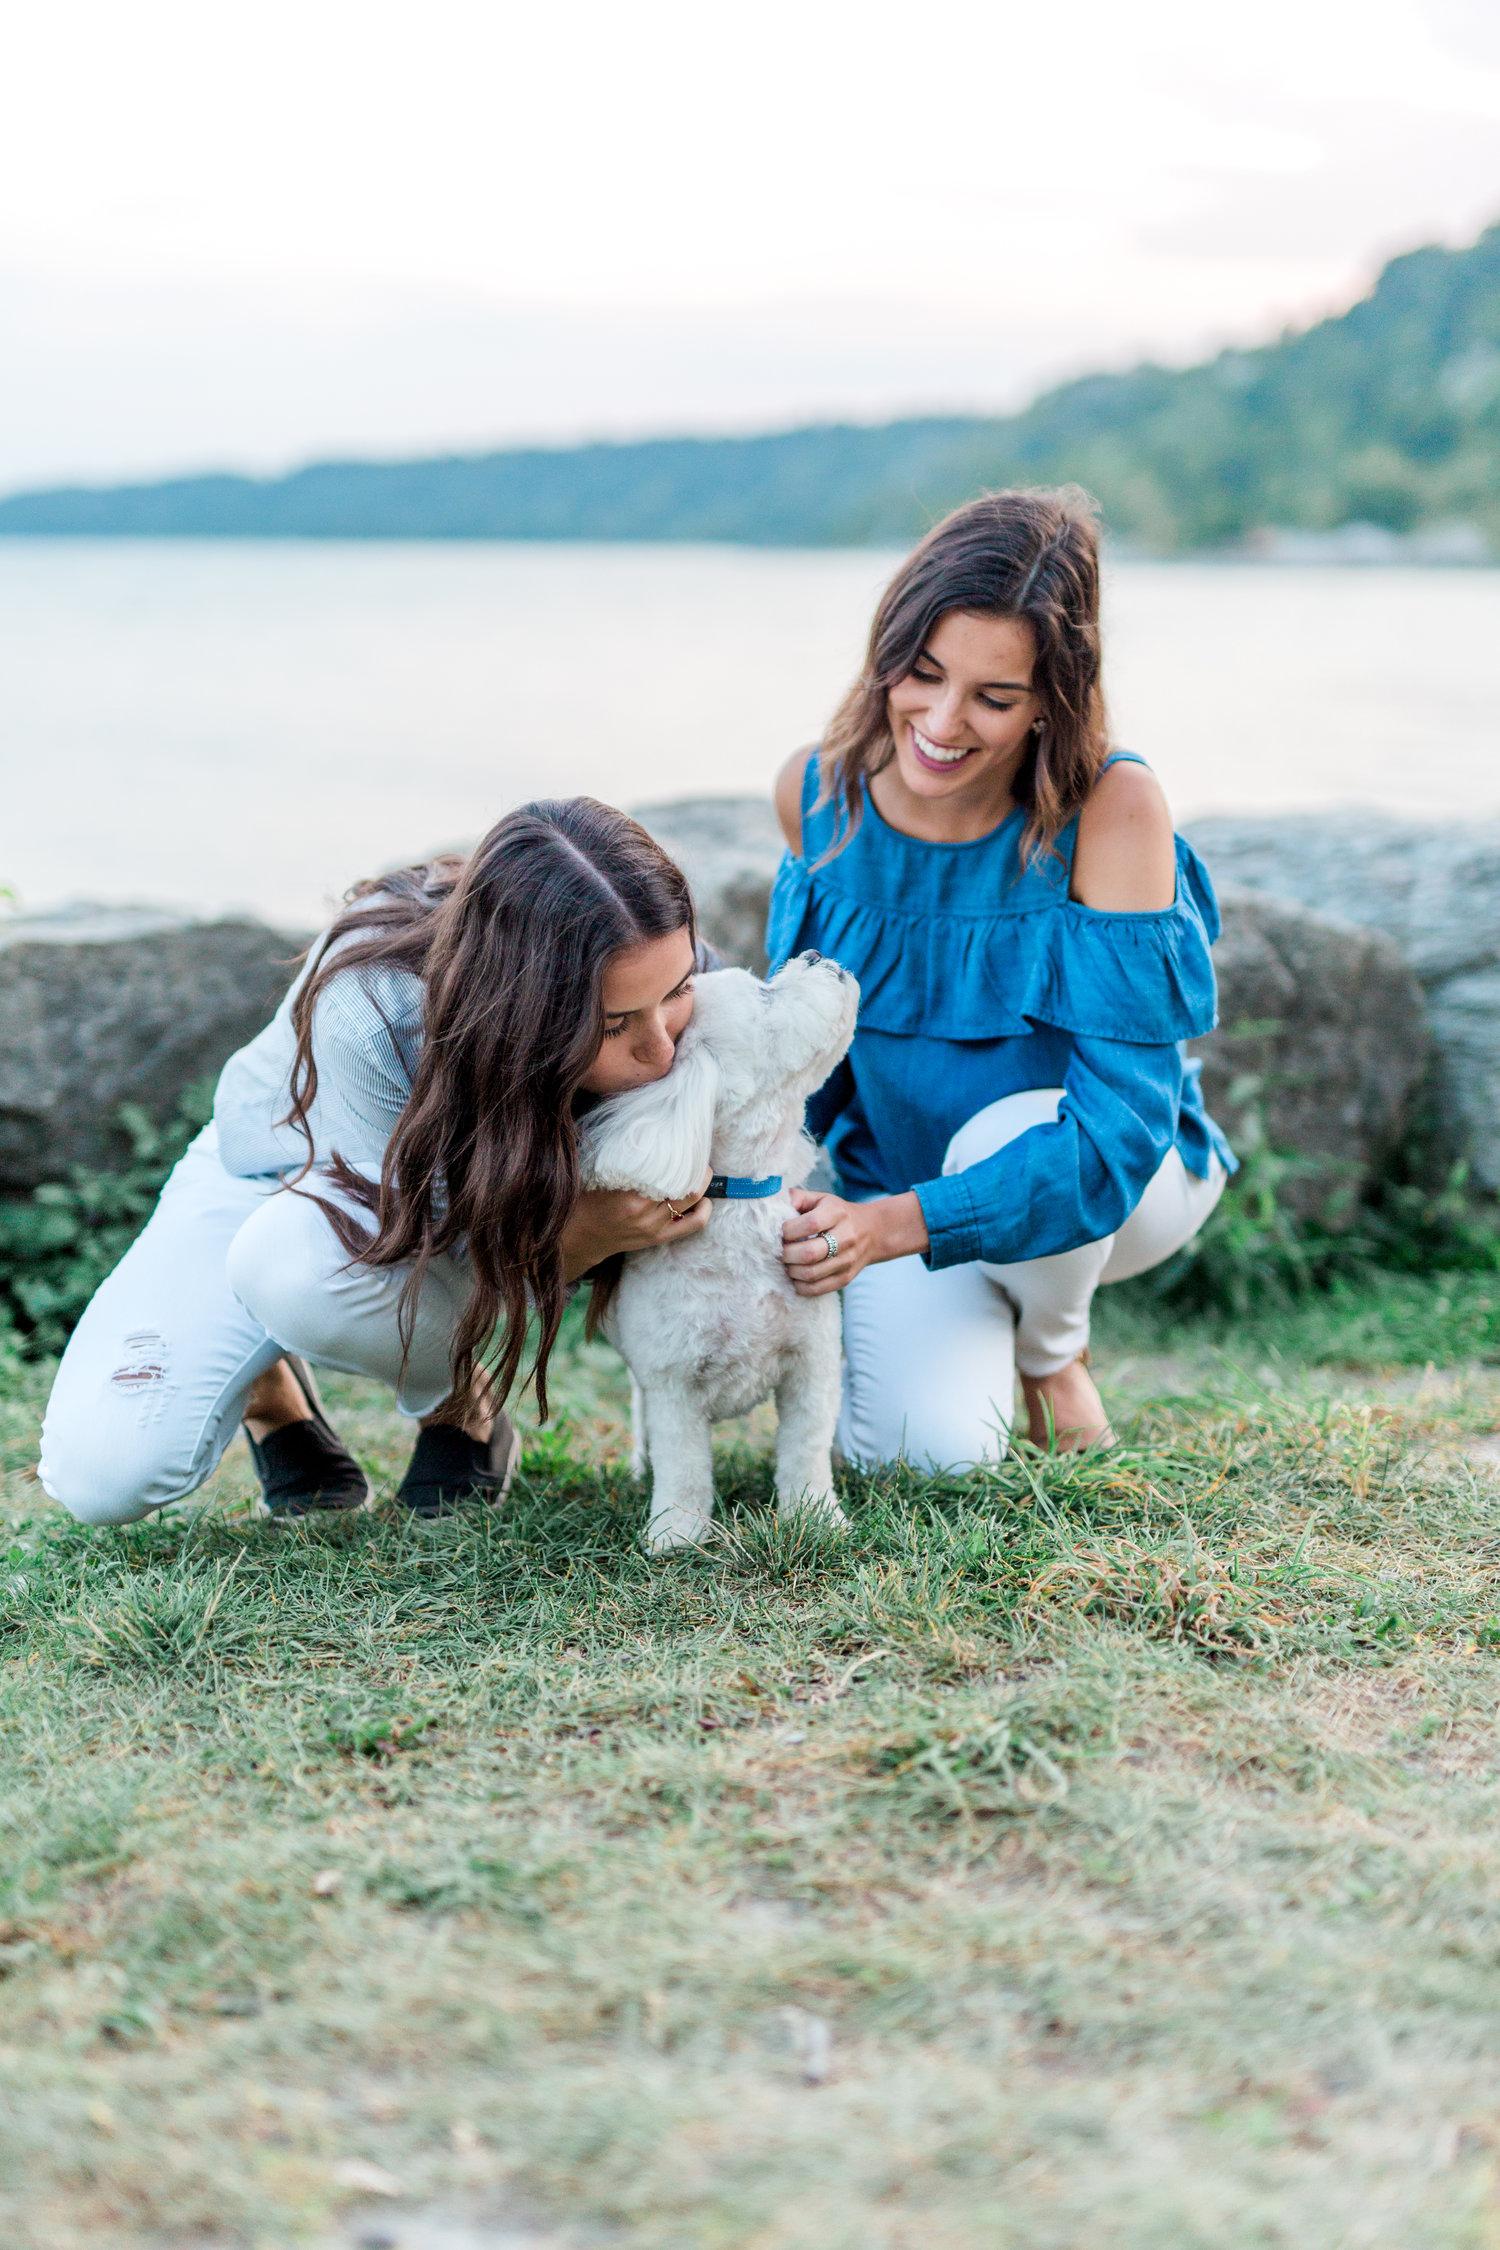 Danielle-Giroux-Amir-Golbazi-Genua-Family-Photography-Scarborough-Bluffs-9945.jpg